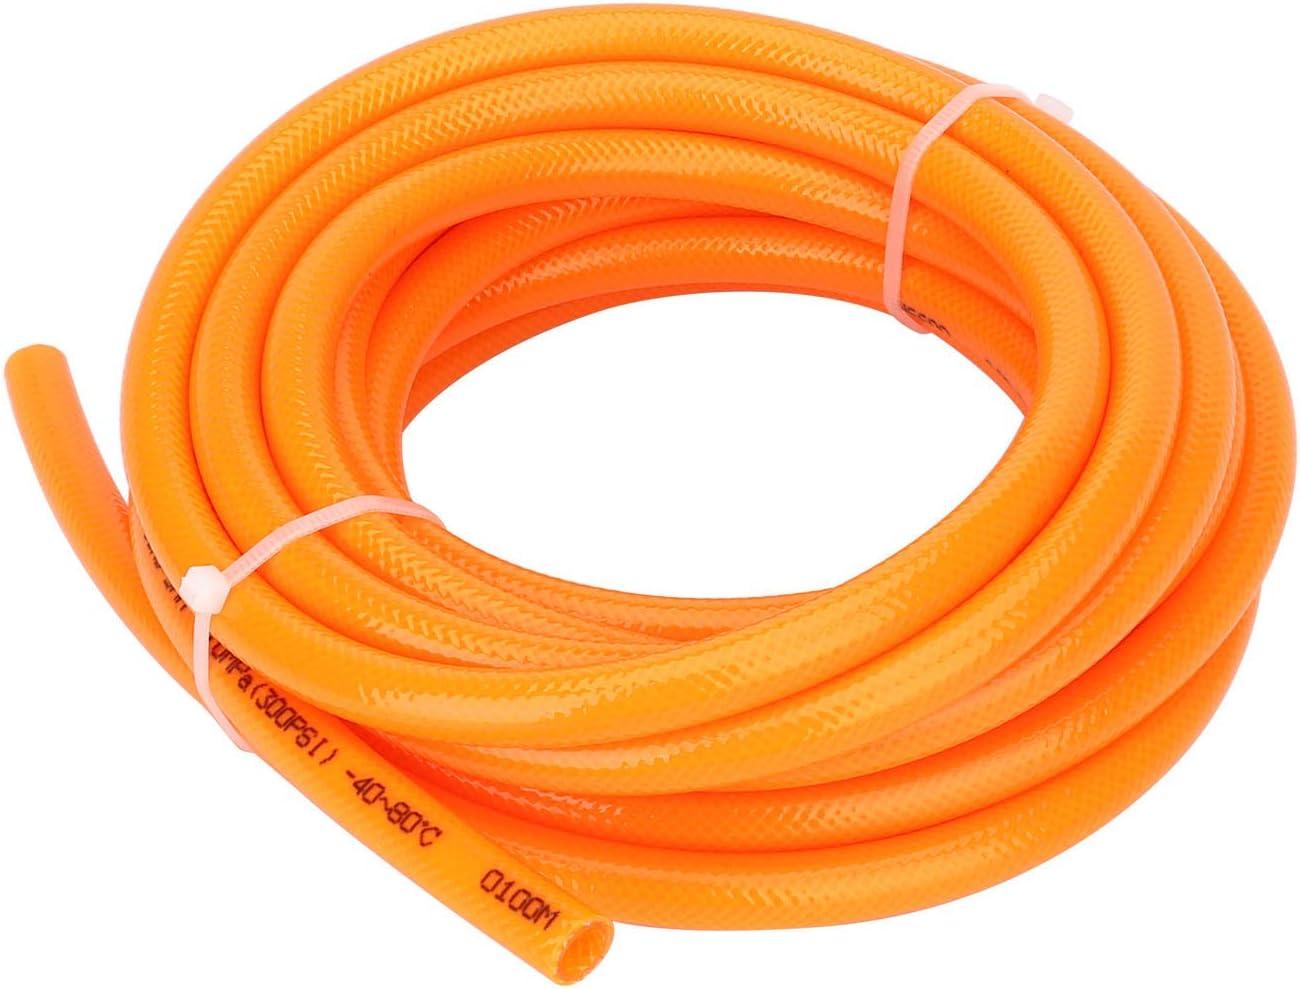 Dia 5mm//8mm Resist High-Temperature Abrasion Extra Pressure Length 10m Surprecision PU Plastic Air Hose Tube 32.8ft